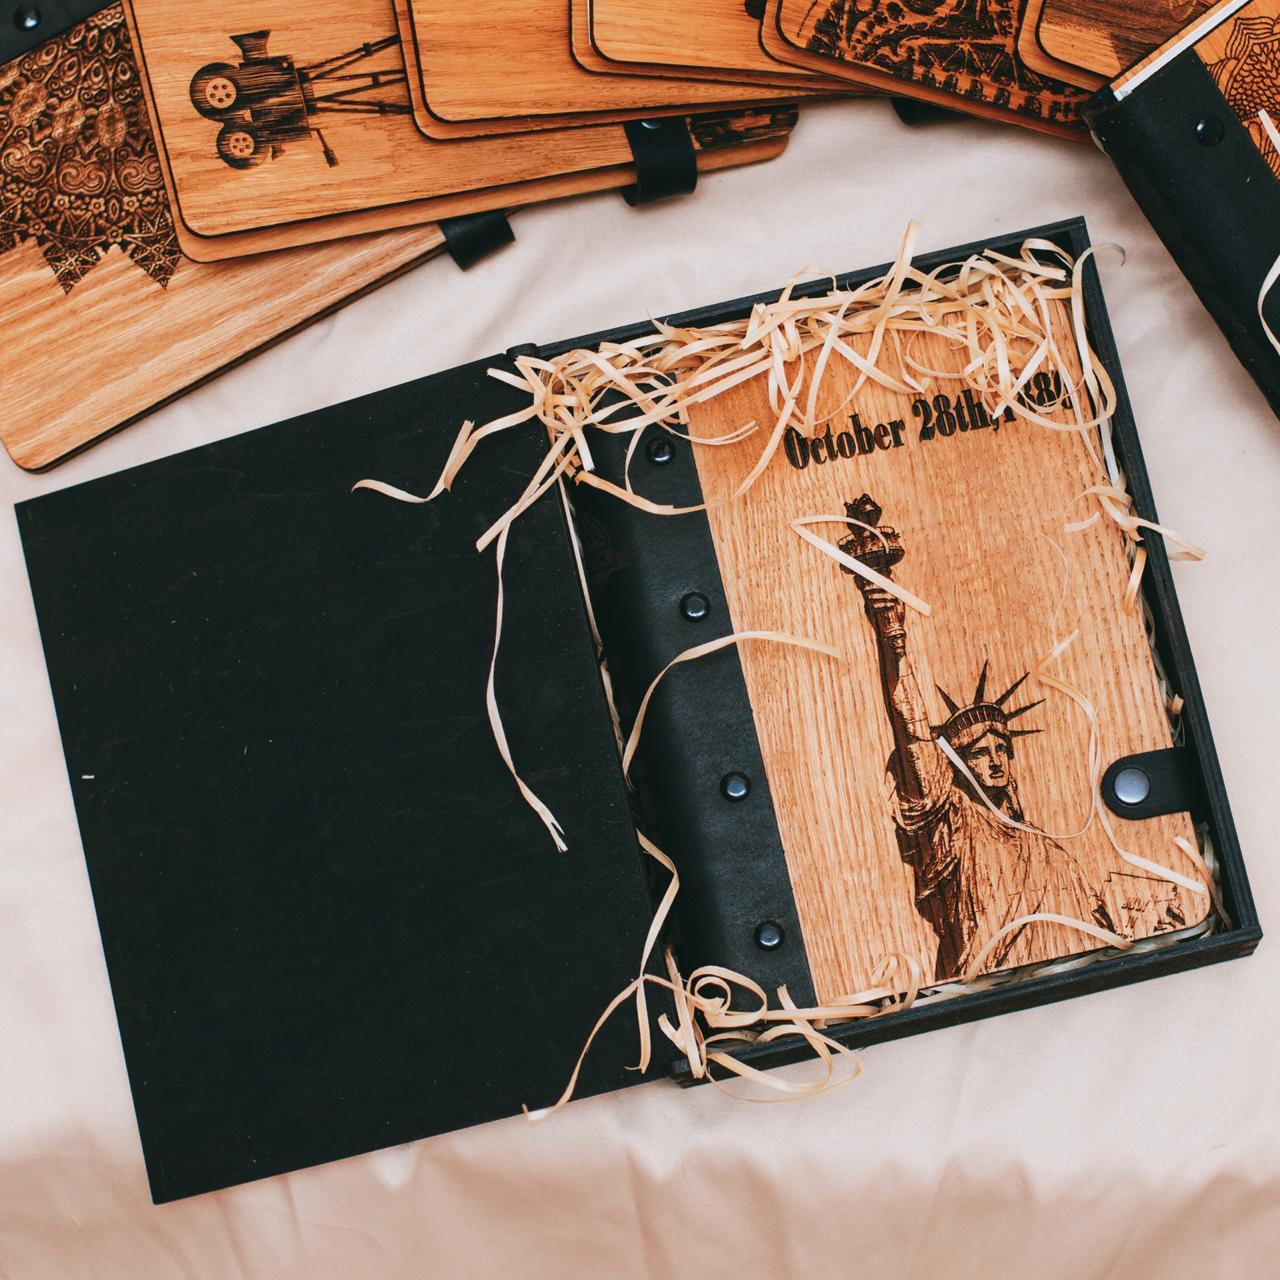 oakbook, блокноты из дерева, деревянные блокноты